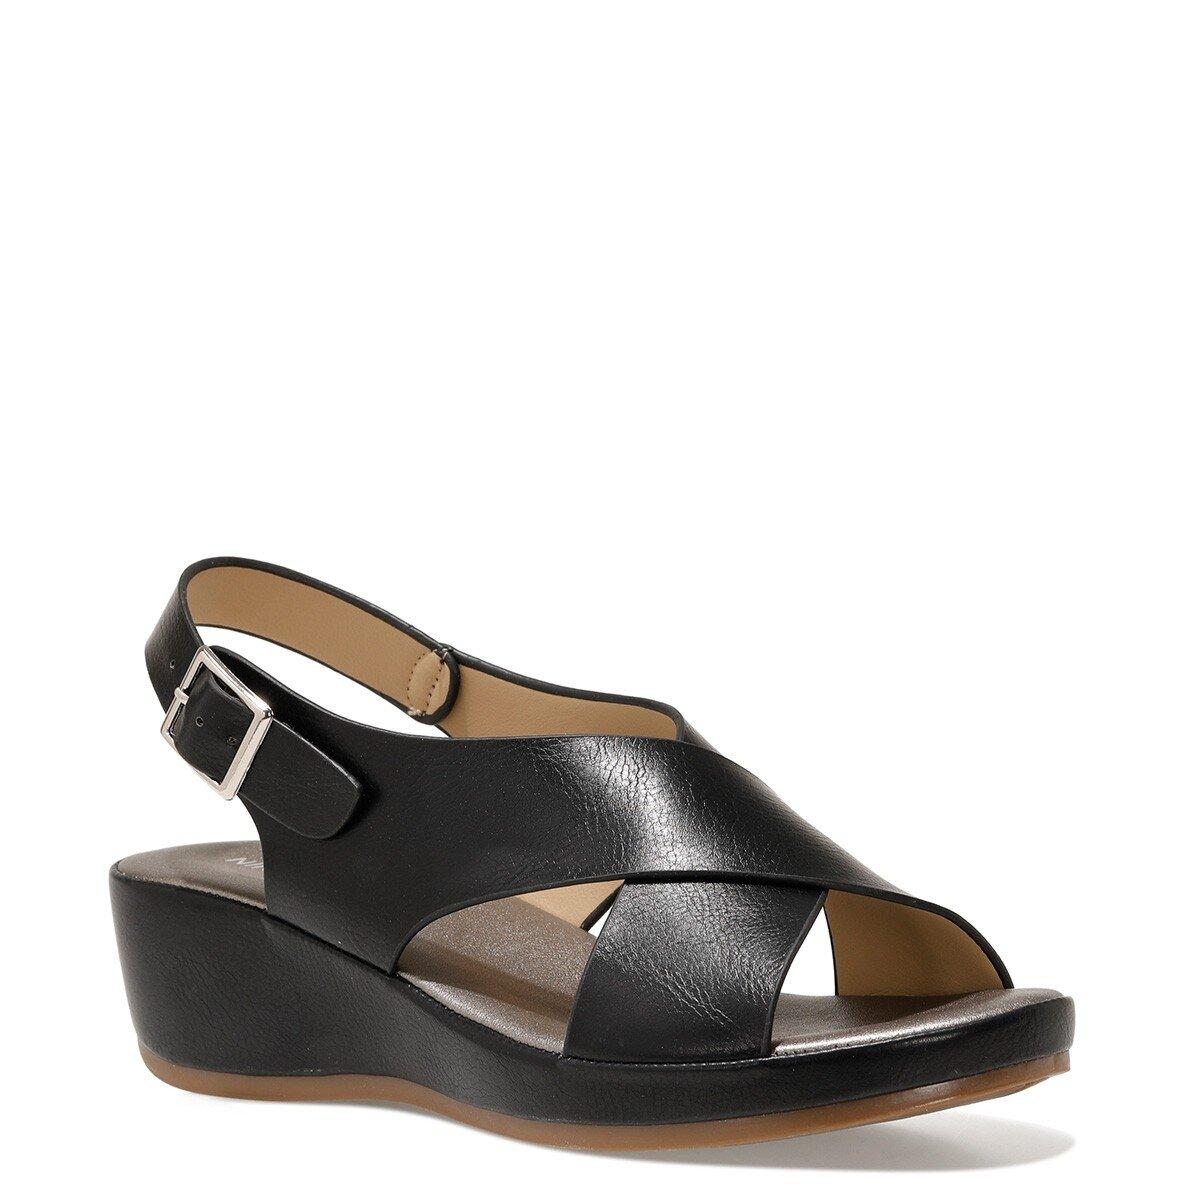 DANBIA 1FX Siyah Kadın Dolgu Topuklu Sandalet